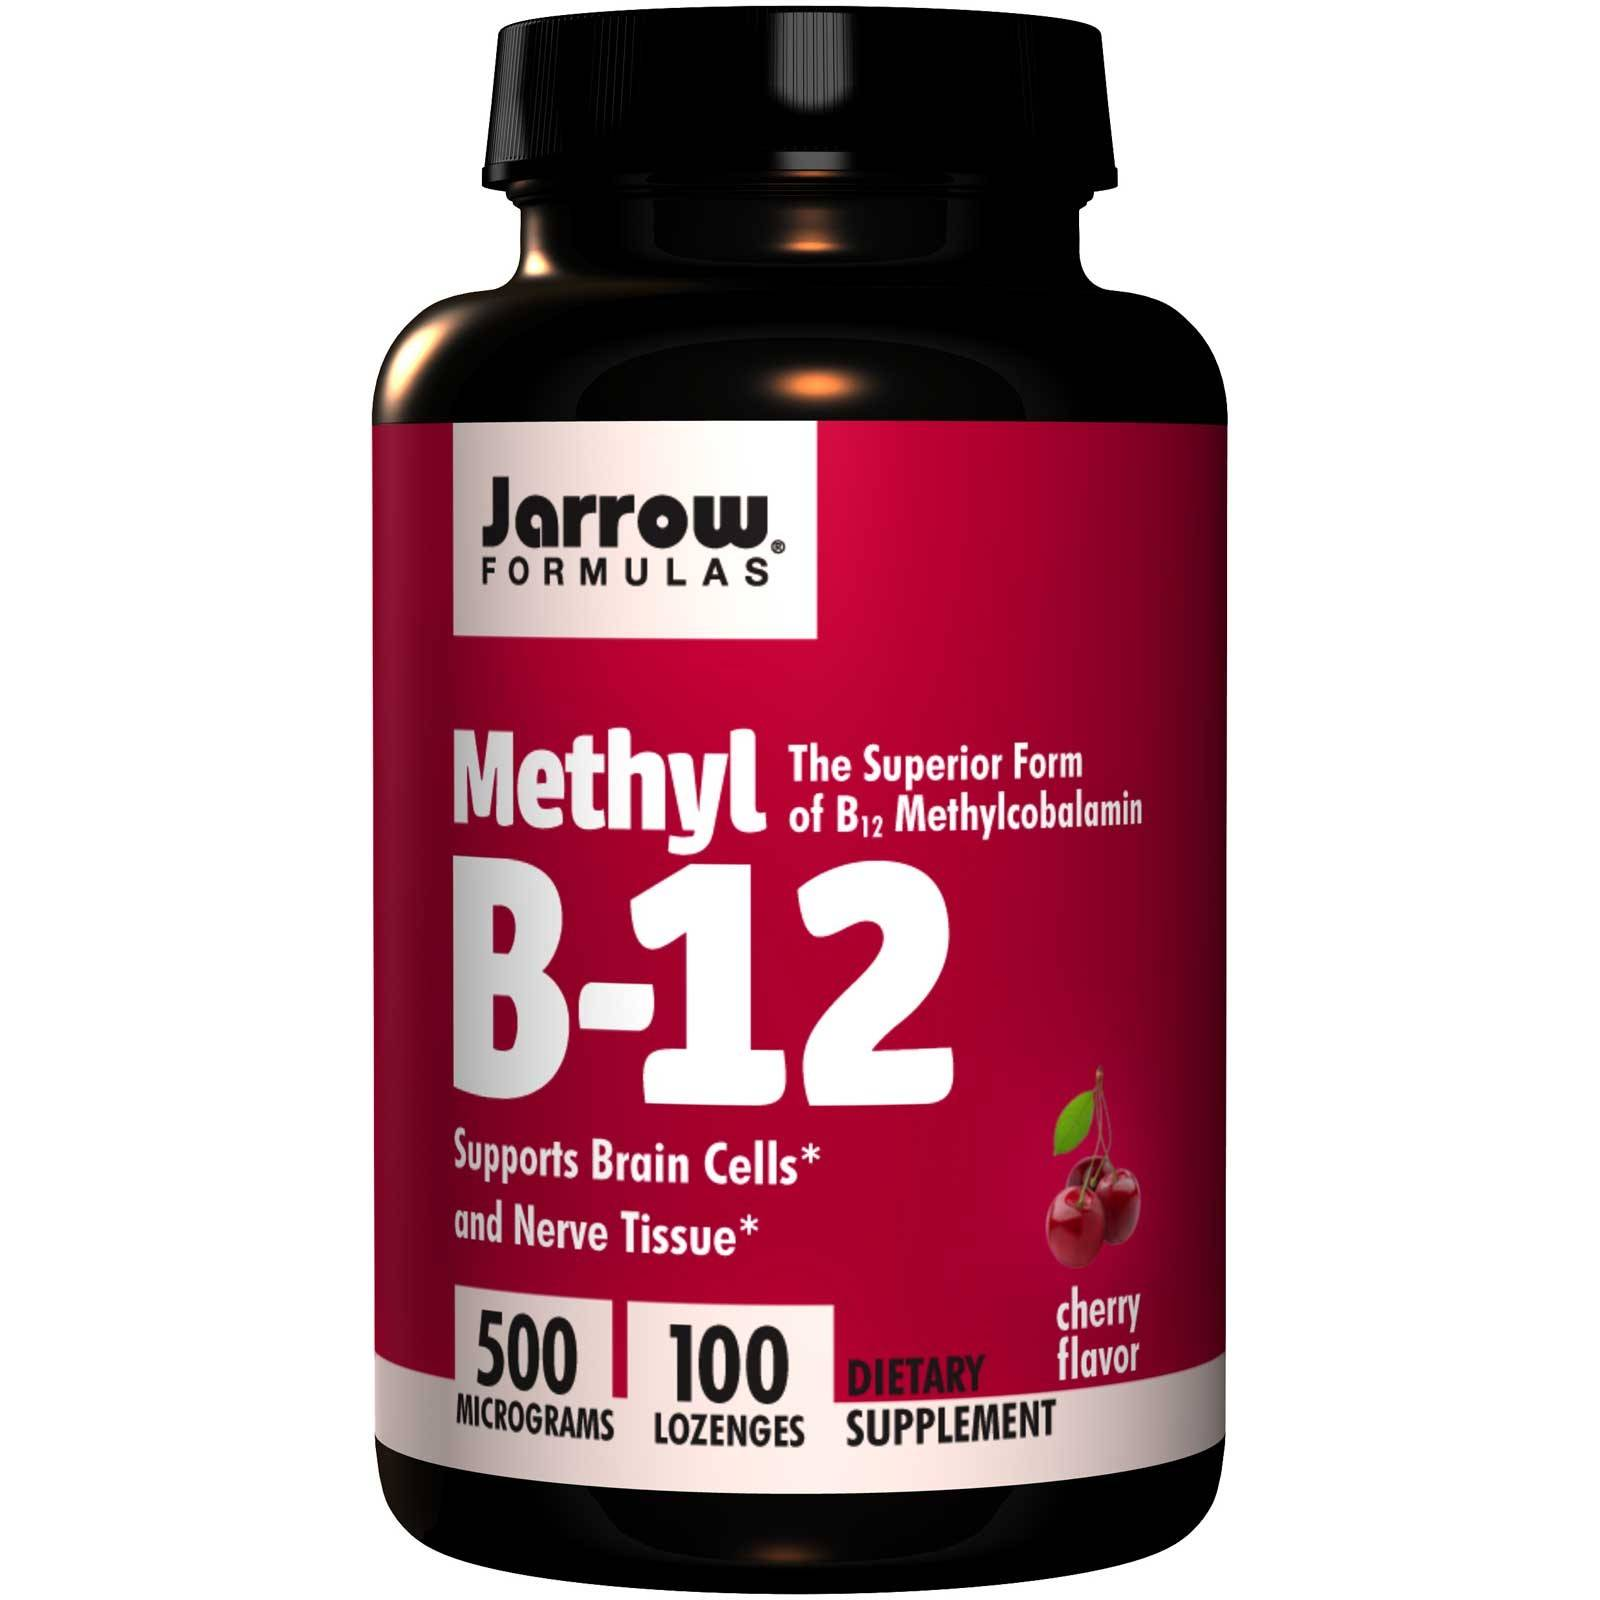 Jarrow Formulas Methyl B-12 Cherry Flavor 500 mcg (100 Lozenges) - Jarrow Formulas